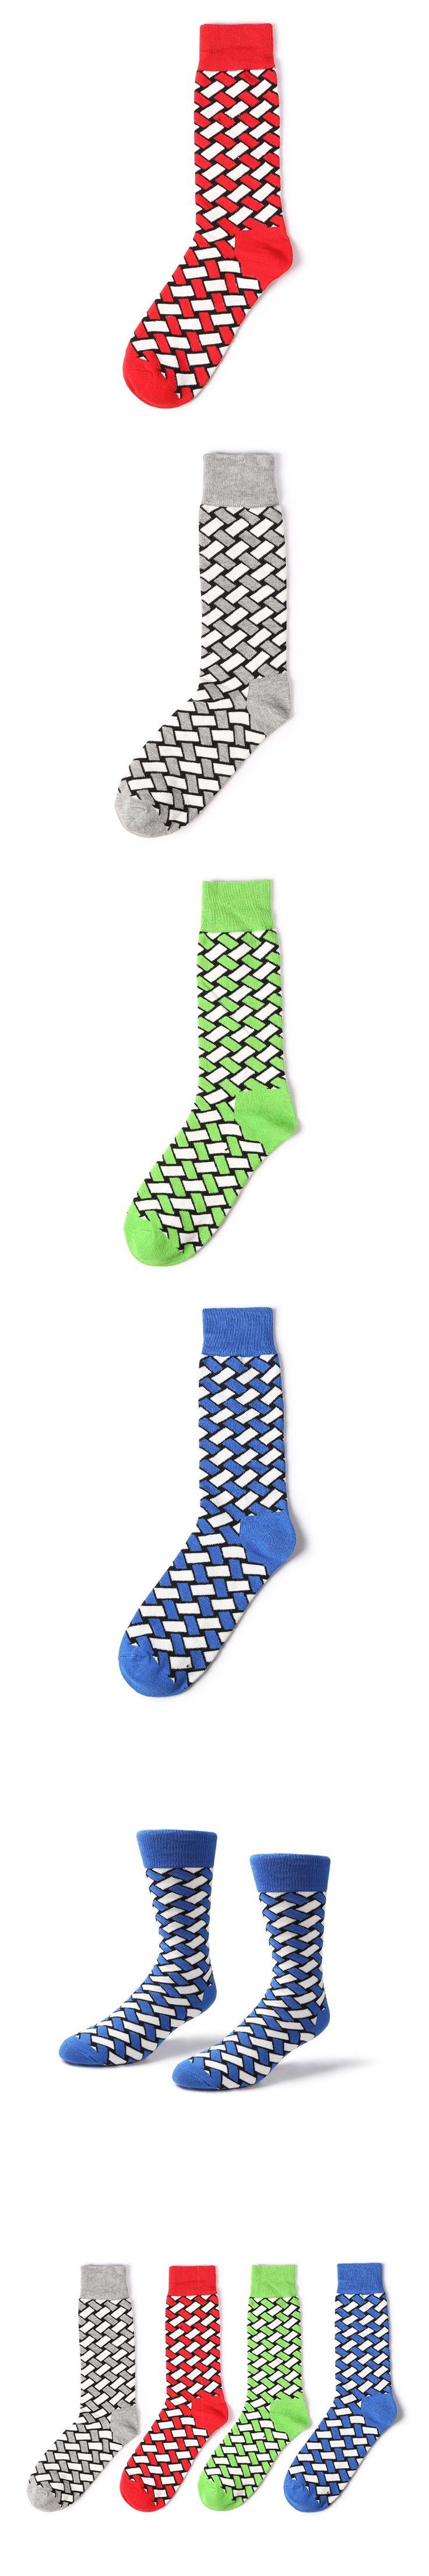 Autumn Winter Fashion Tide Sock Men's British Socks Color Male Plaid Stockings Business Socks Men High Quality Calcetas Hombre